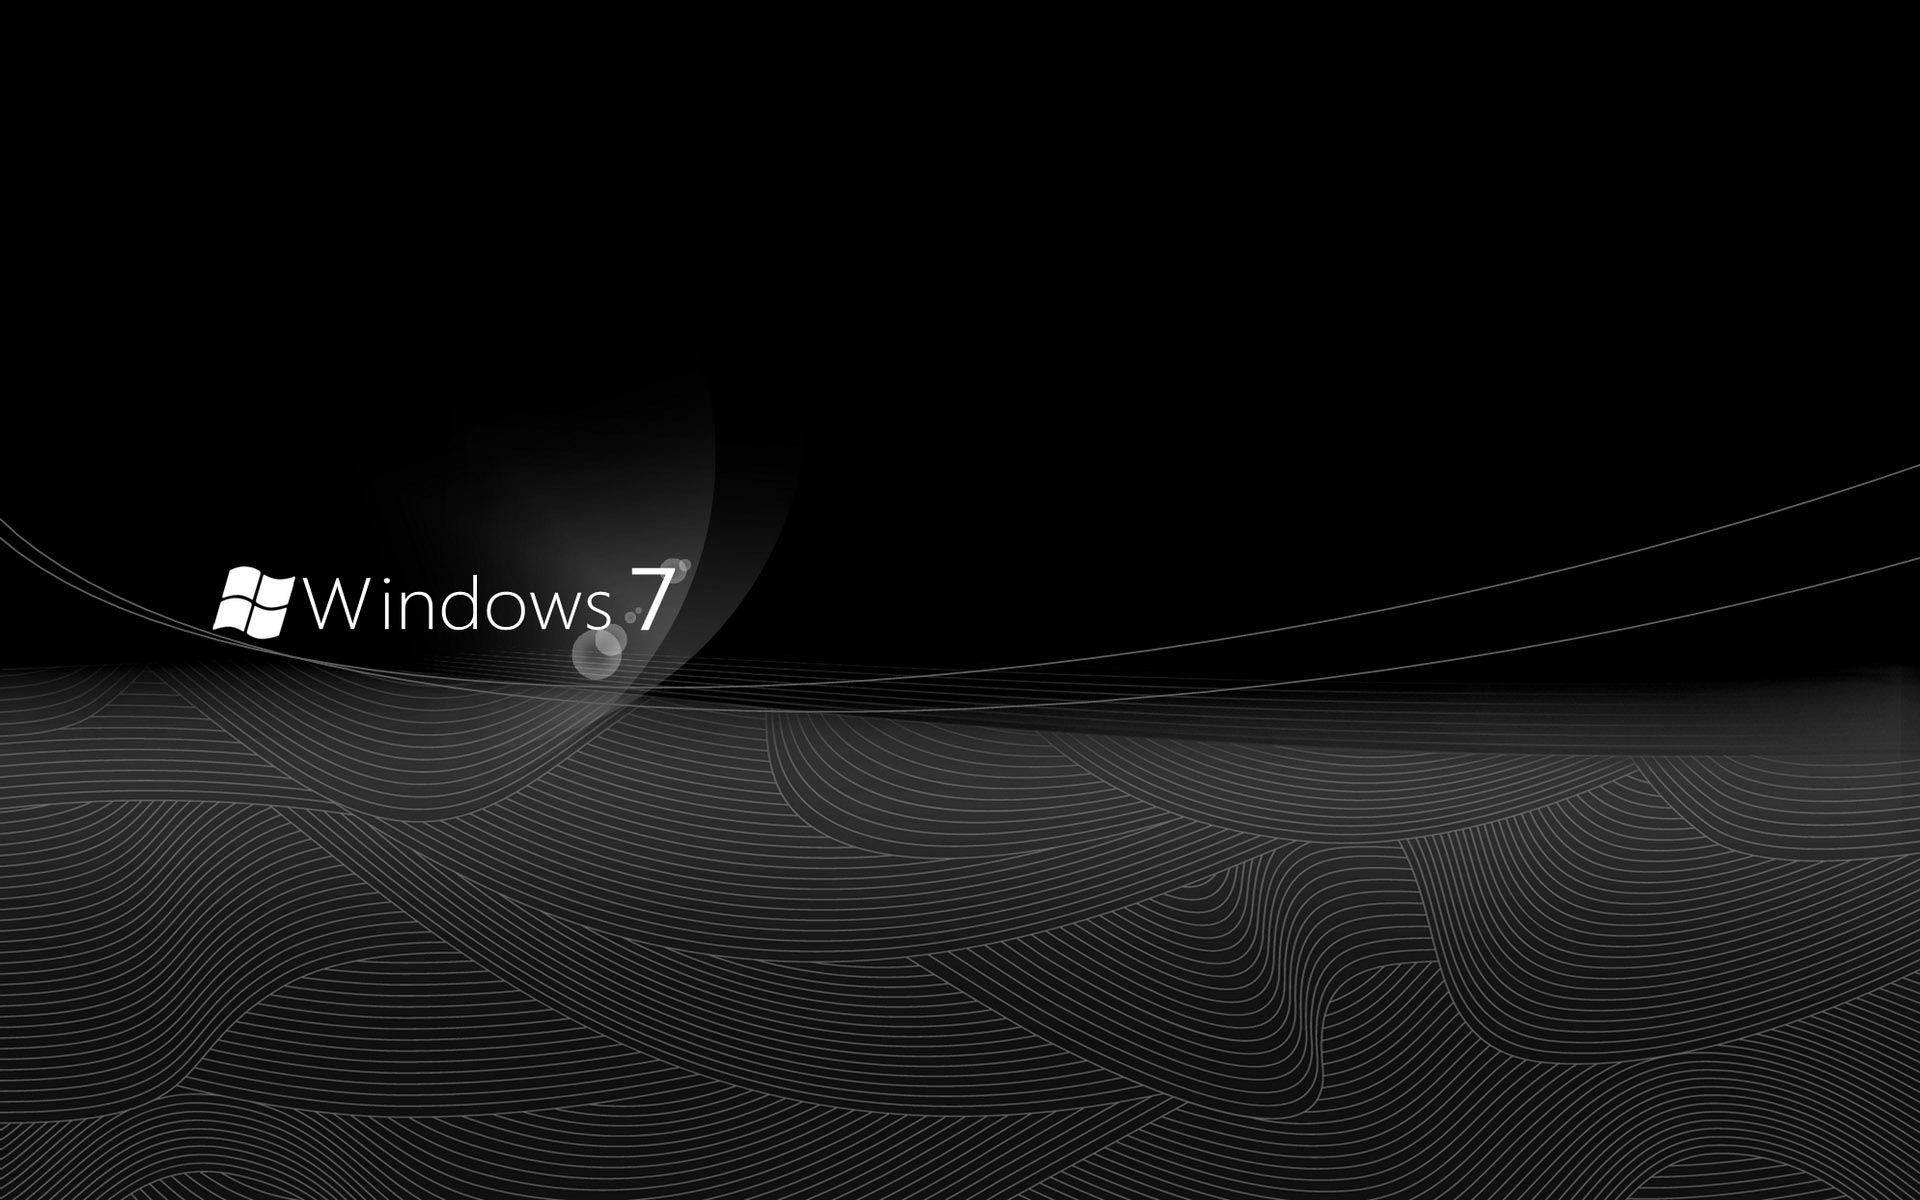 Wallpaper Hd For Desktop Full Screen Windows 7 Best Hd Wallpaper